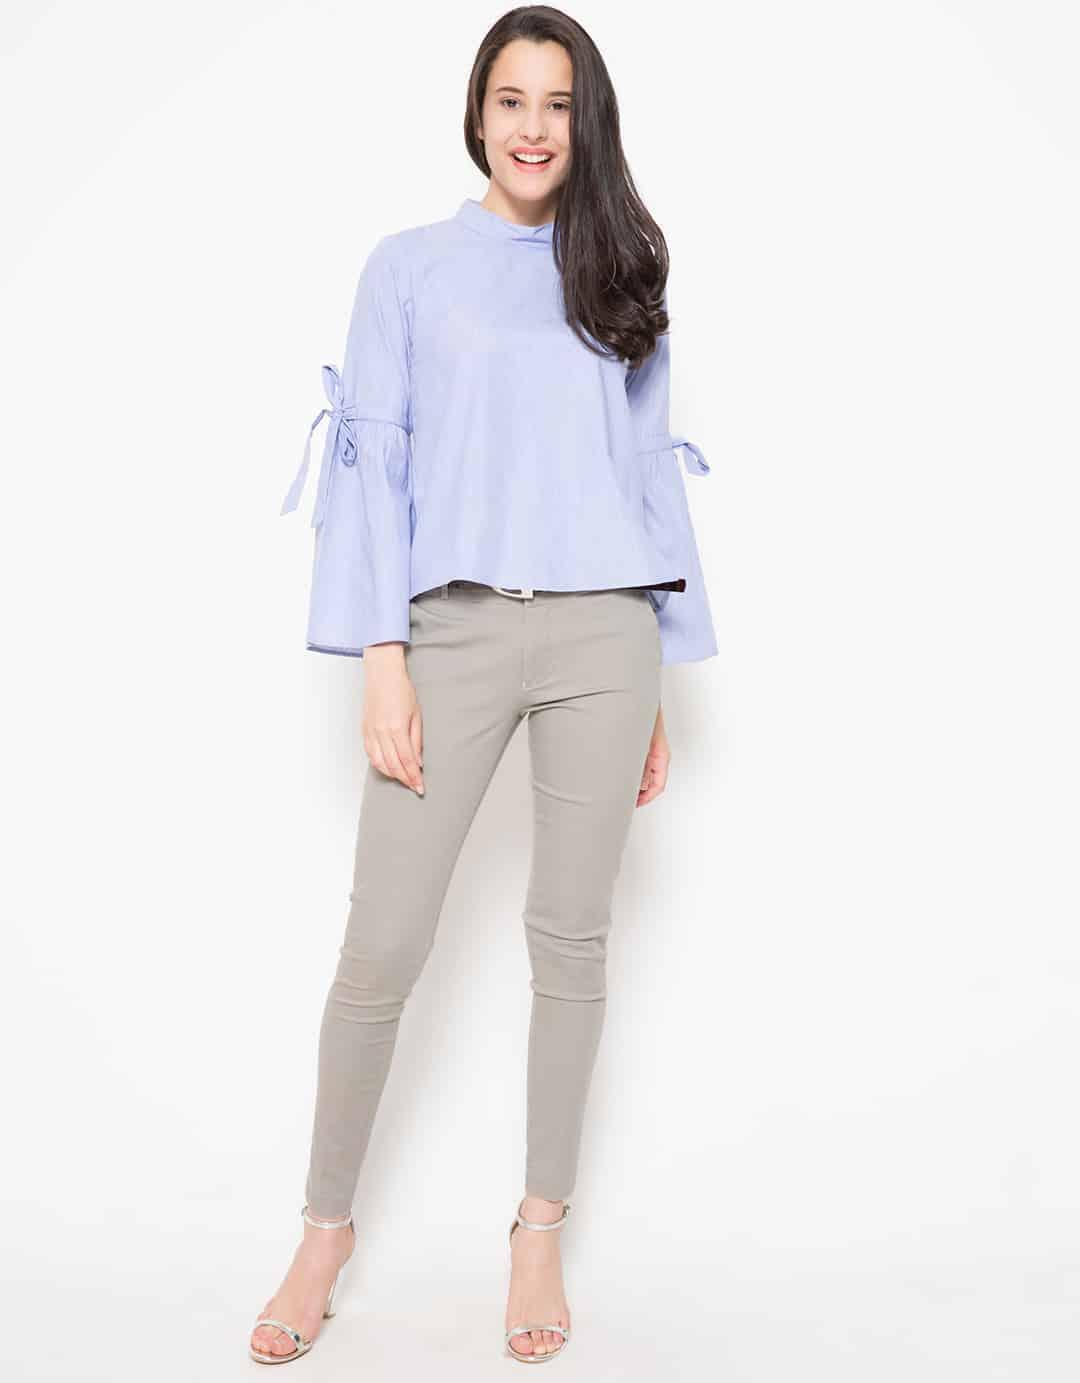 connexion ribbon sleeves detailed blouse biru 3911037 4 29191 - Bosan Baju Lebaran Warna Putih? Coba 11 Blouse Berwarna Pastel di Bawah 250 Ribu Ini!